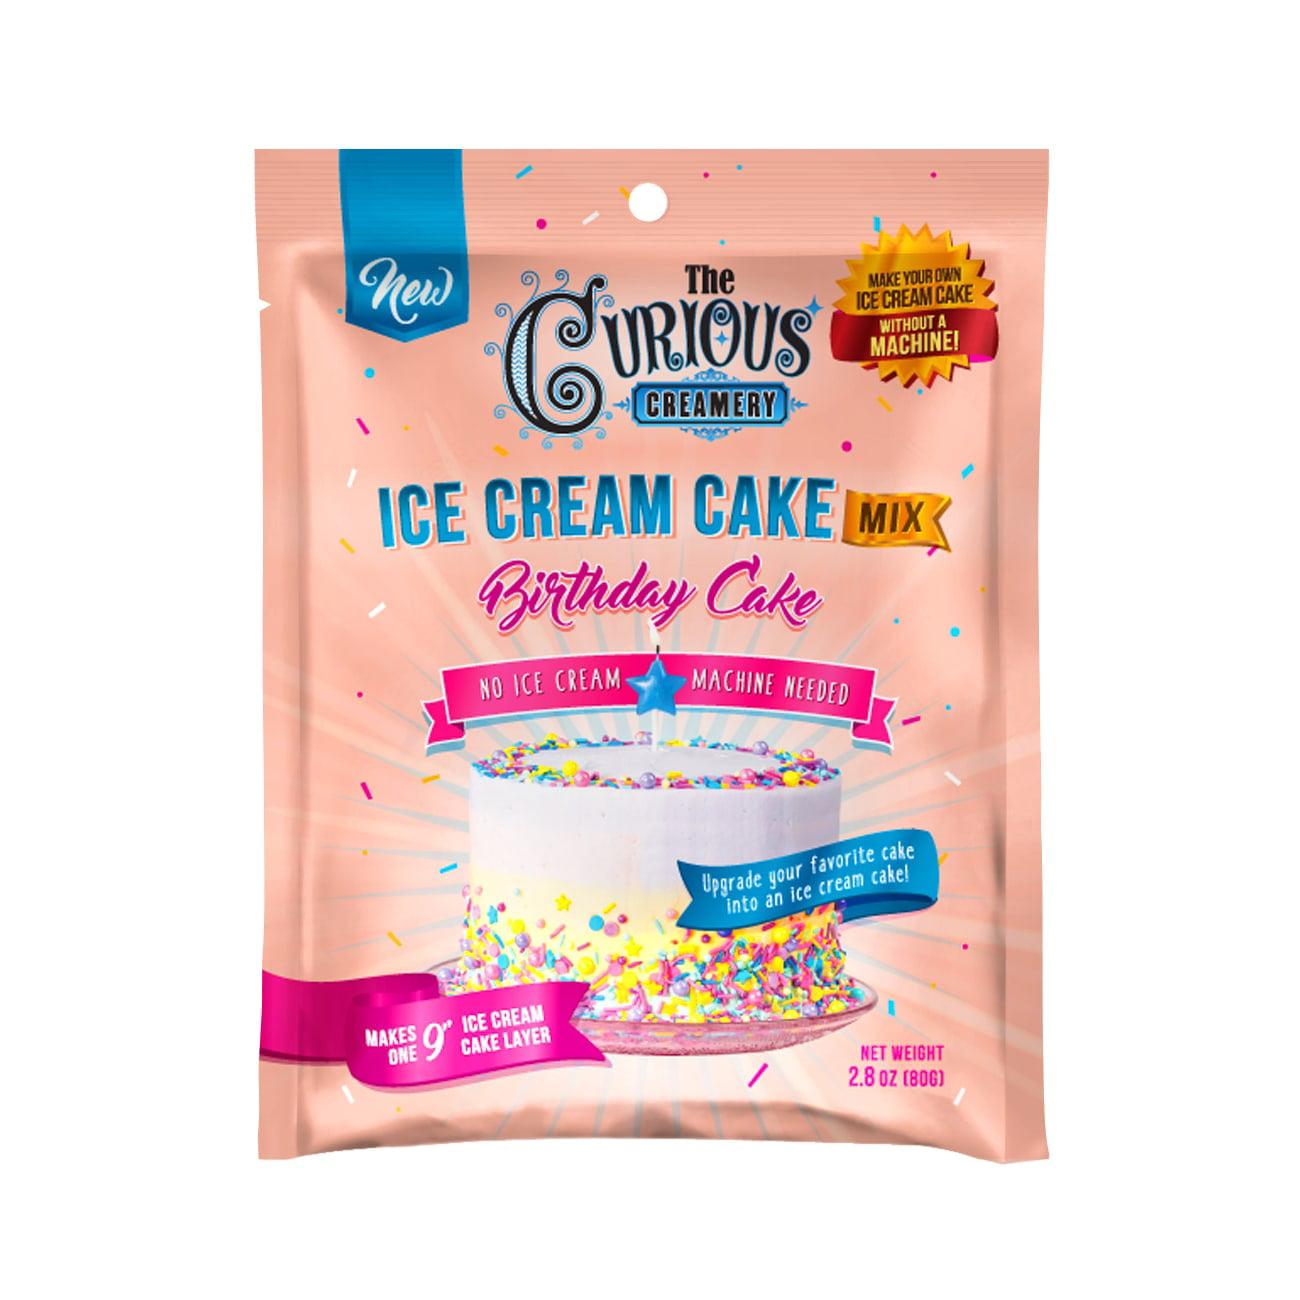 Curious Creamery Birthday Cake Ice Cream Cake Mix No Ice